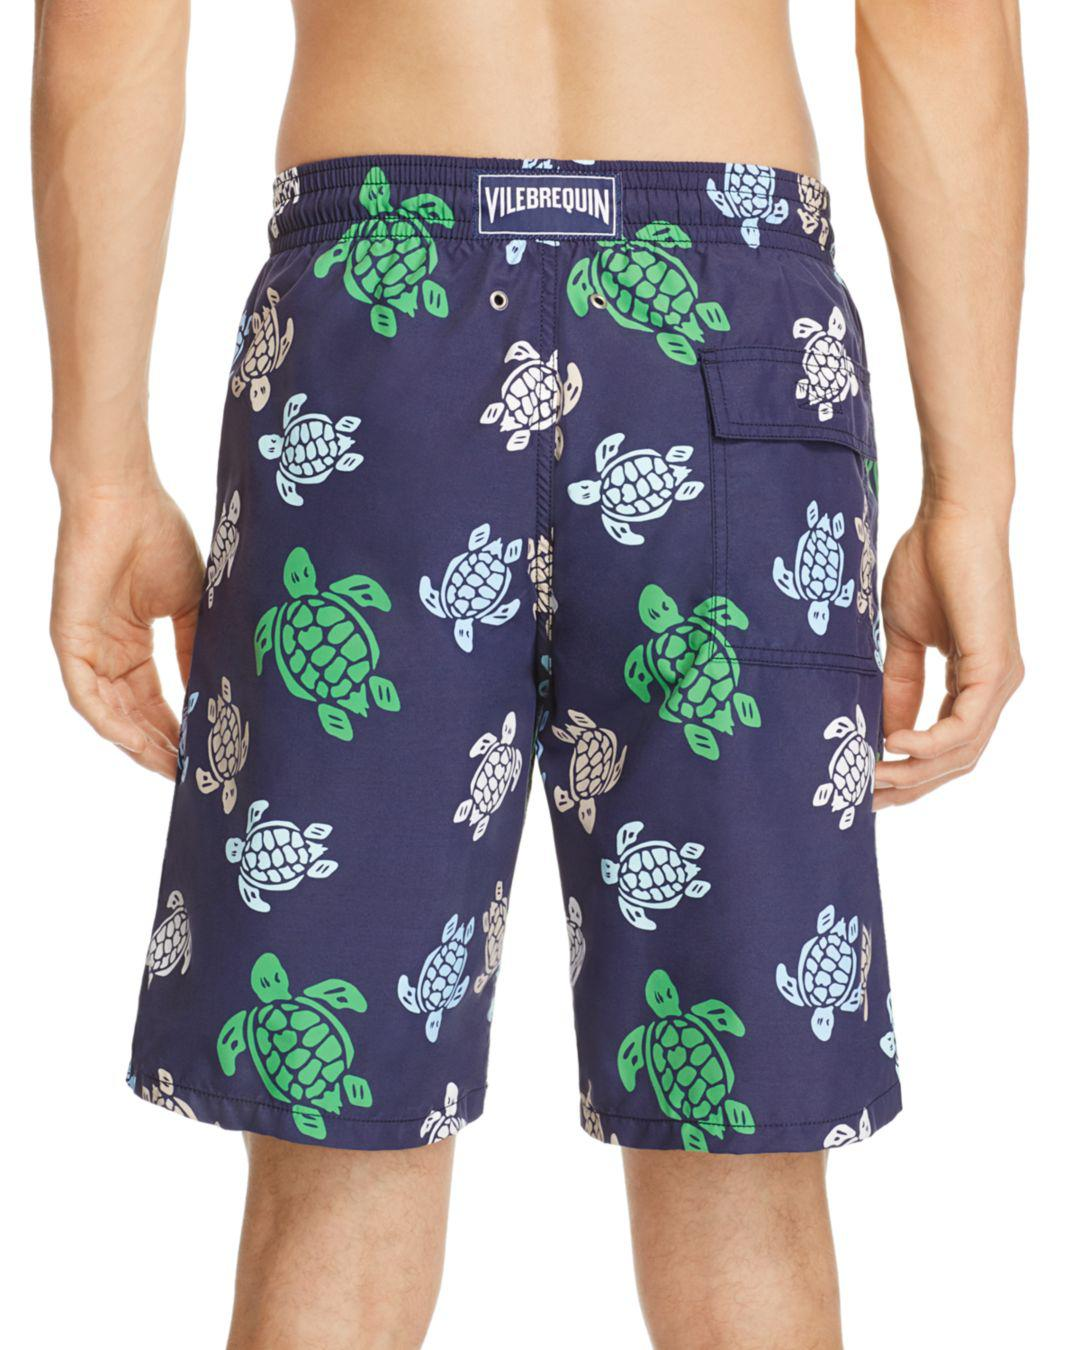 555448a2f8 Vilebrequin Okua Multicolored Turtle-print Swim Trunks in Blue for Men -  Lyst